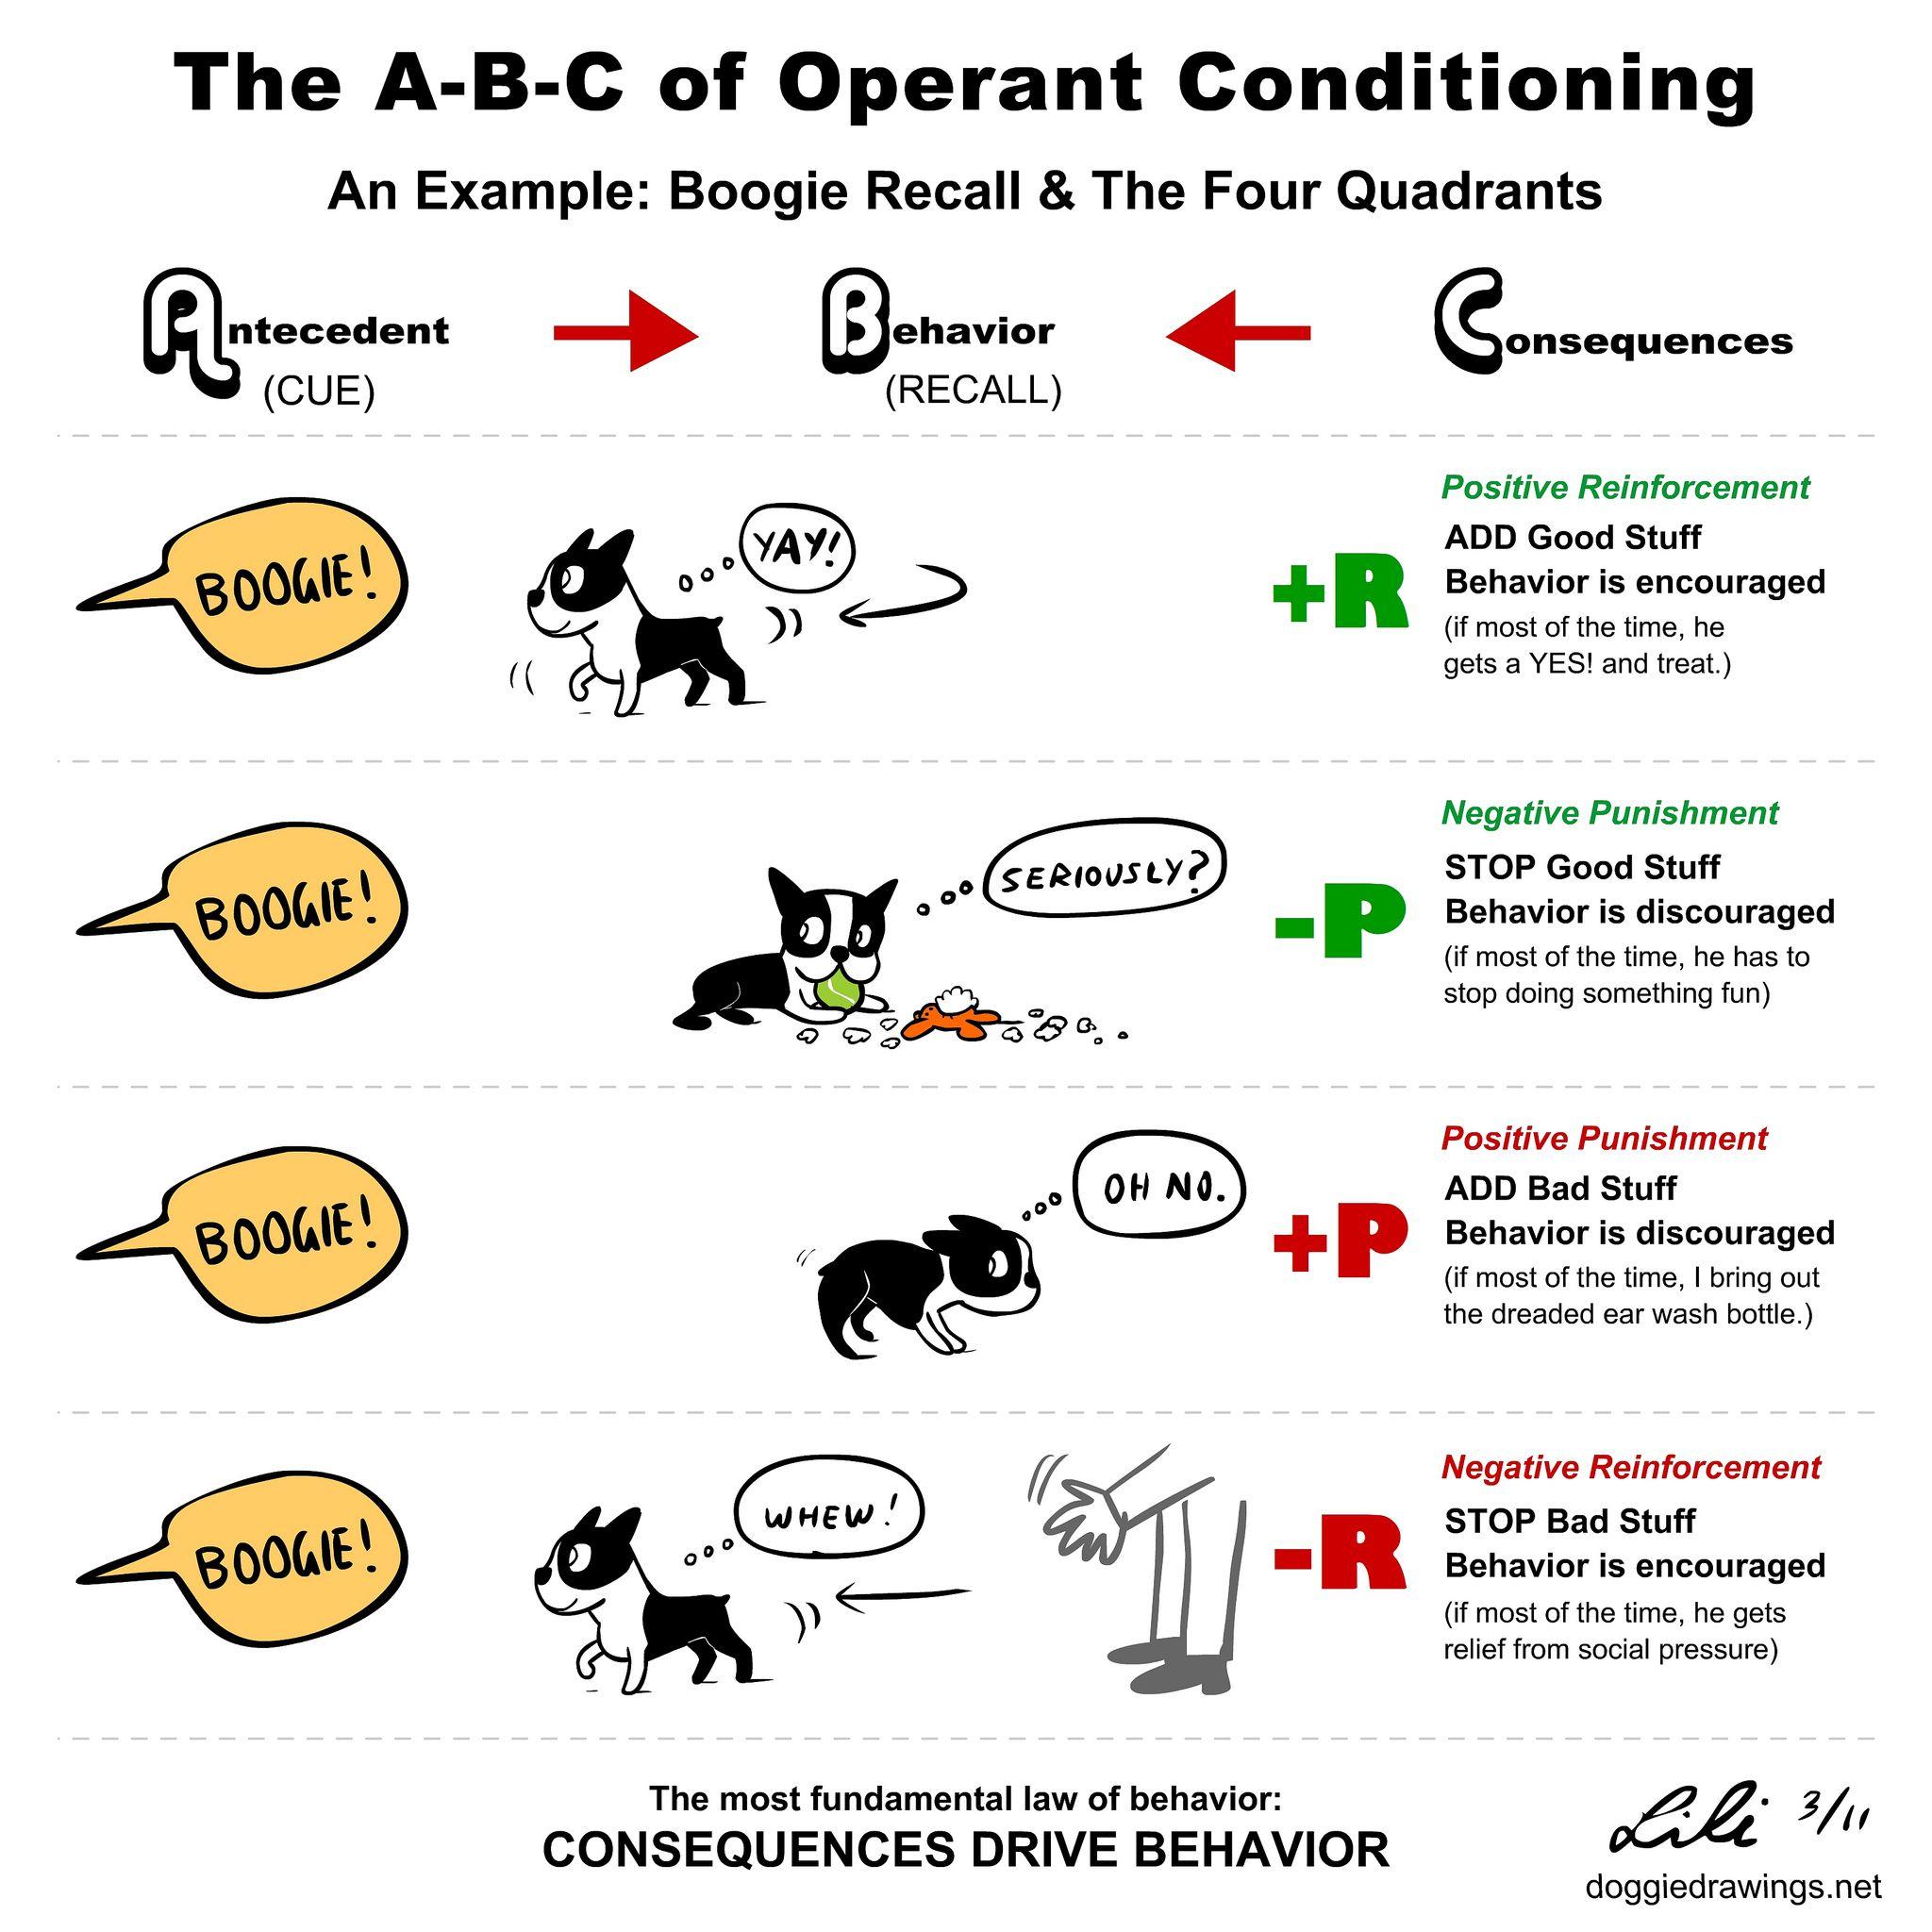 5498007787 410ee3ec9d O Operant Conditioning Positive